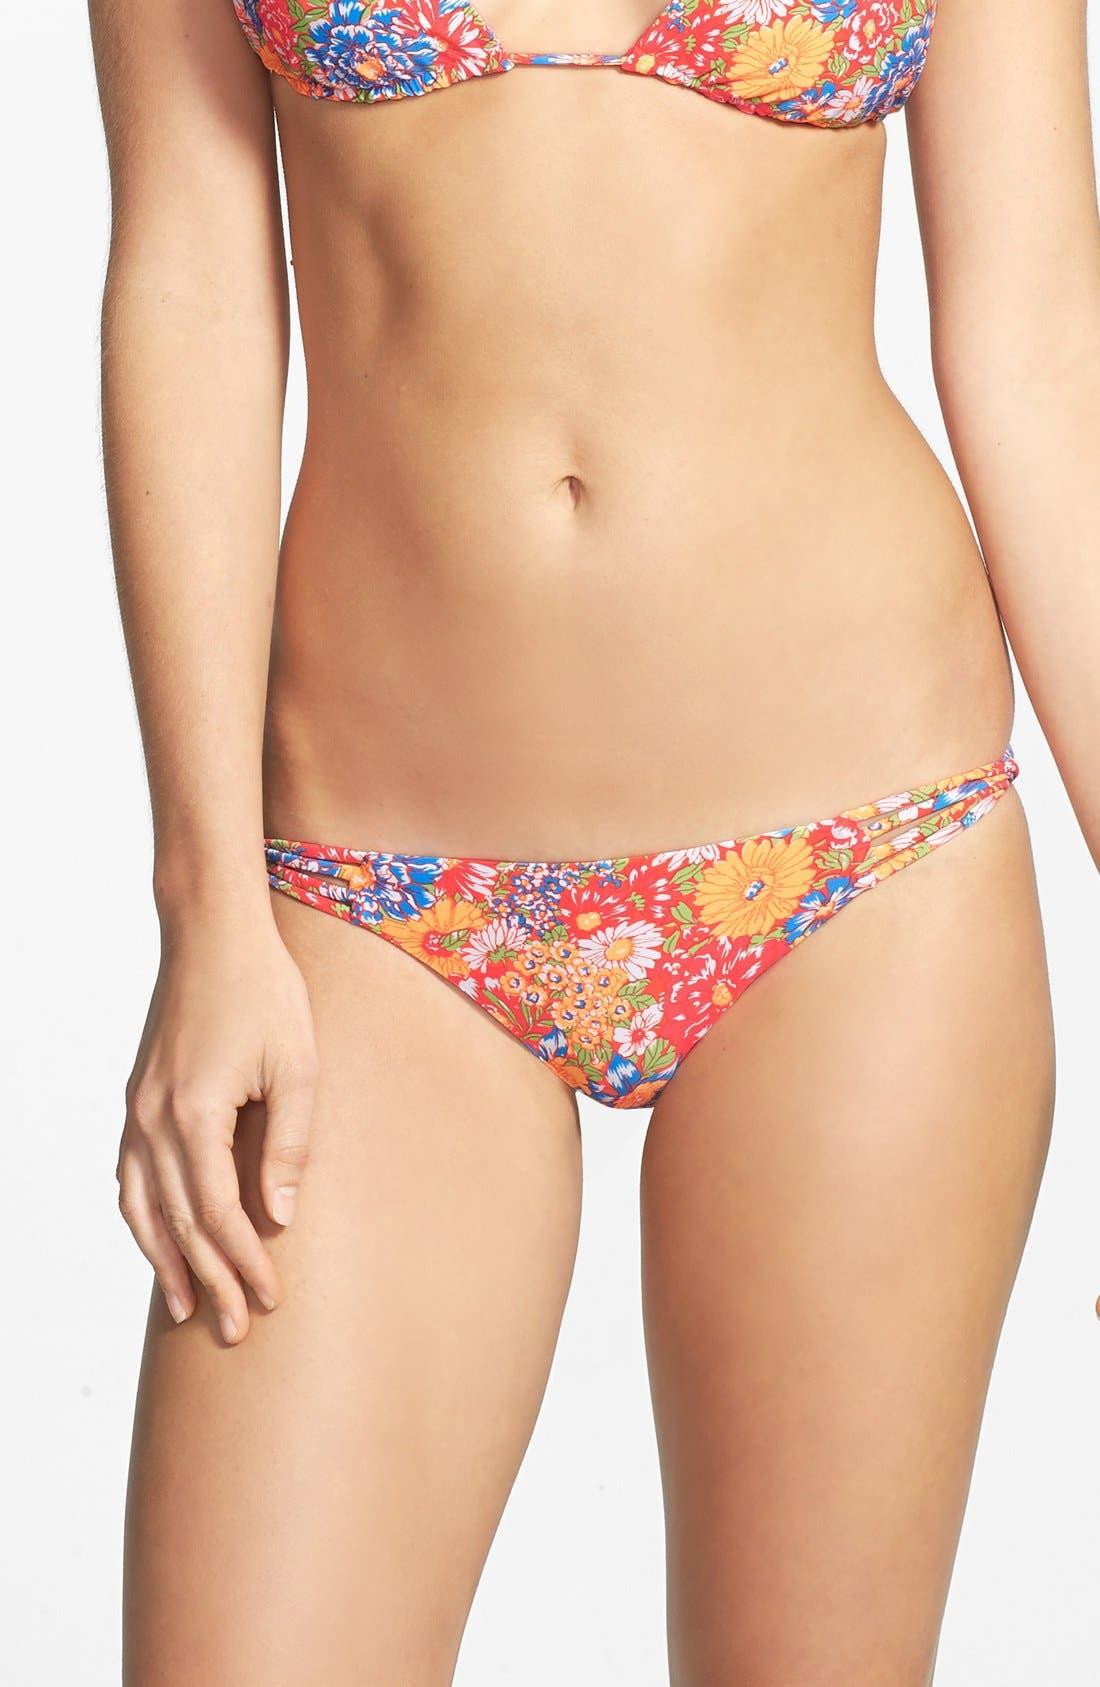 Main Image - O'Neill 'Citrus Floral' Reversible Strappy Twist Bikini Bottoms